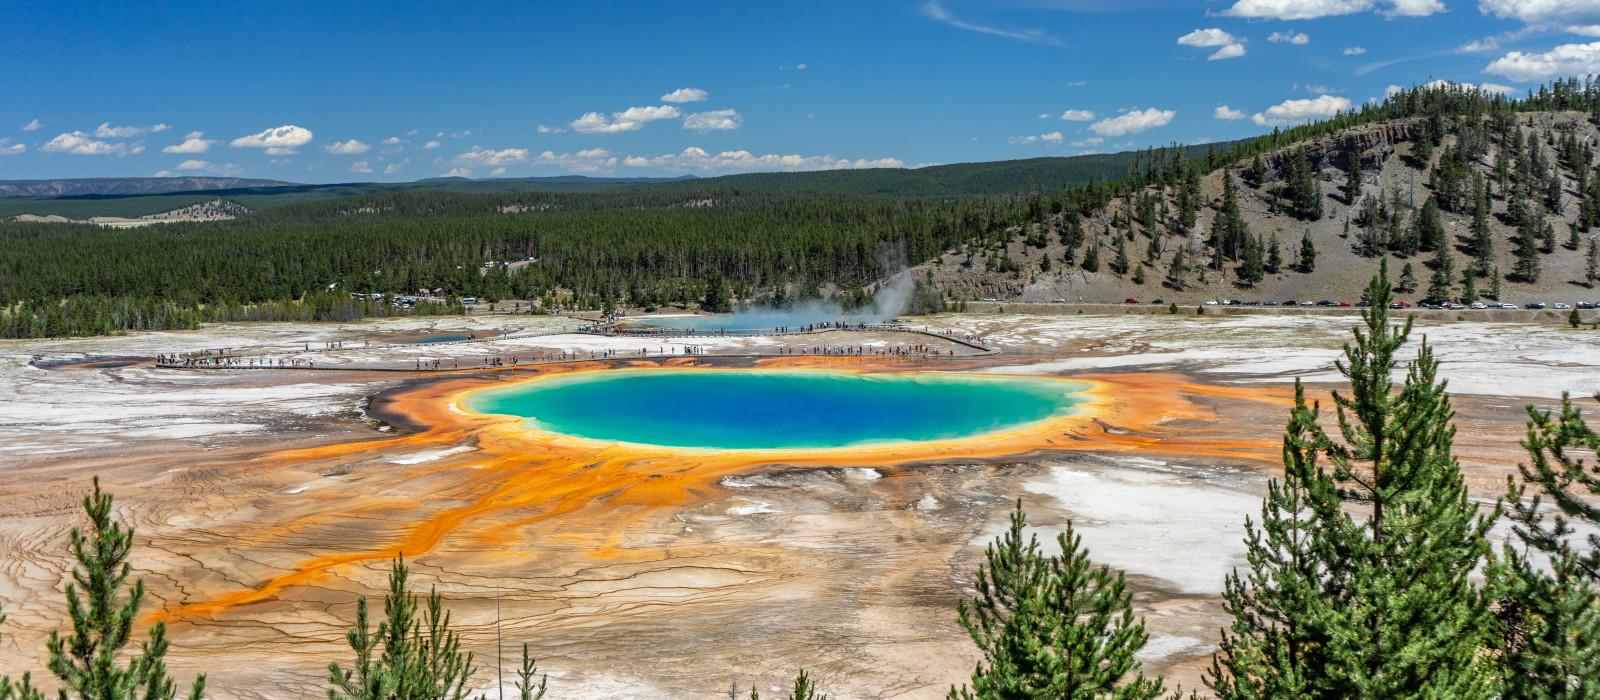 Destination Yellowstone National Park USA